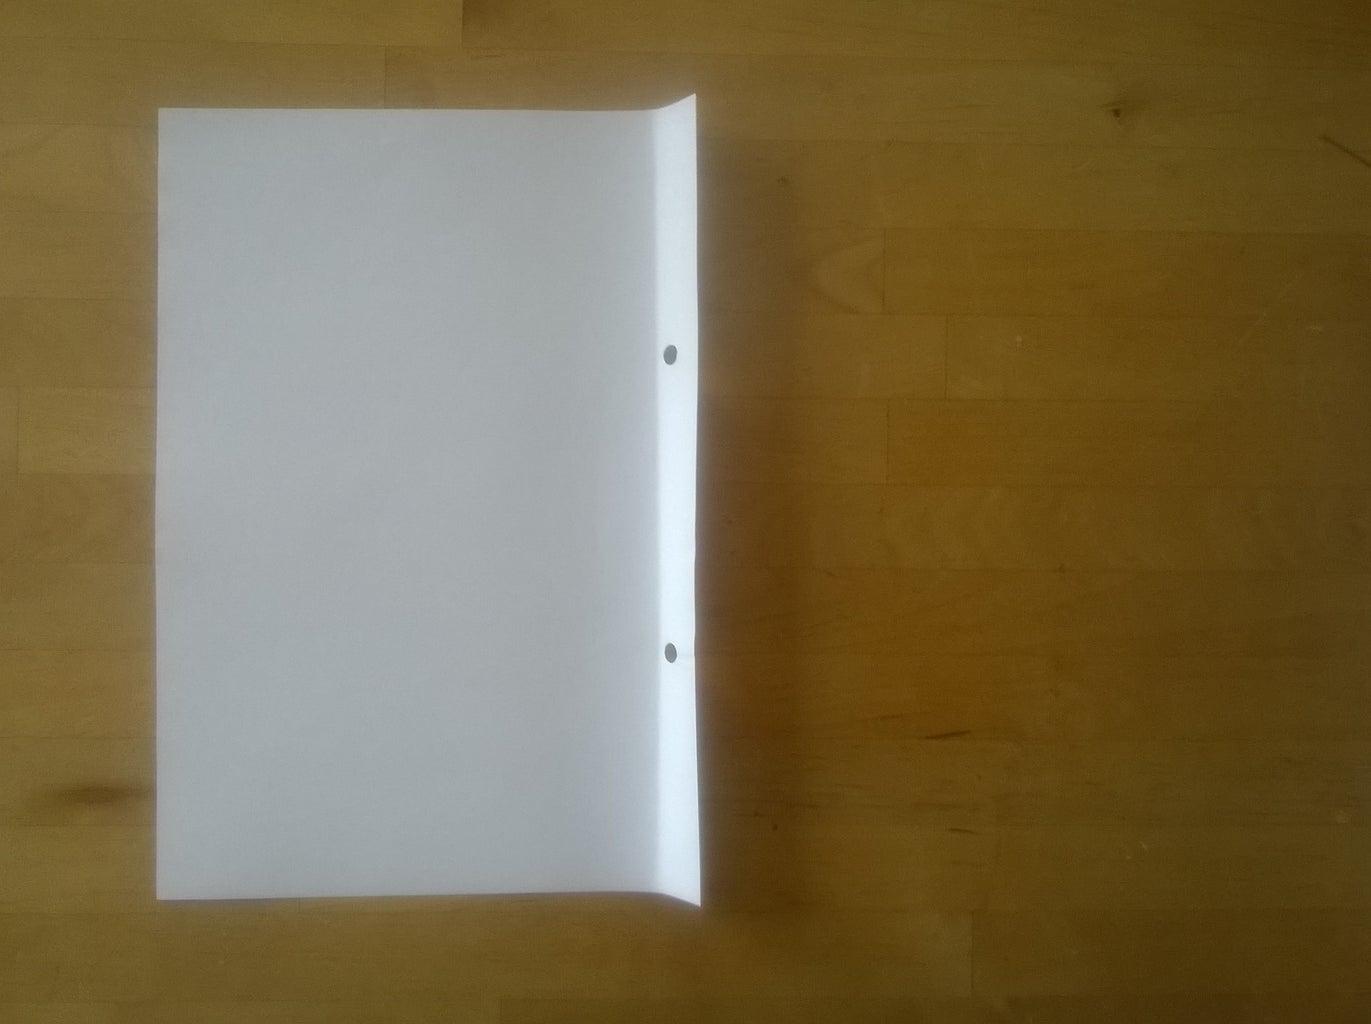 Preparing the Sheets